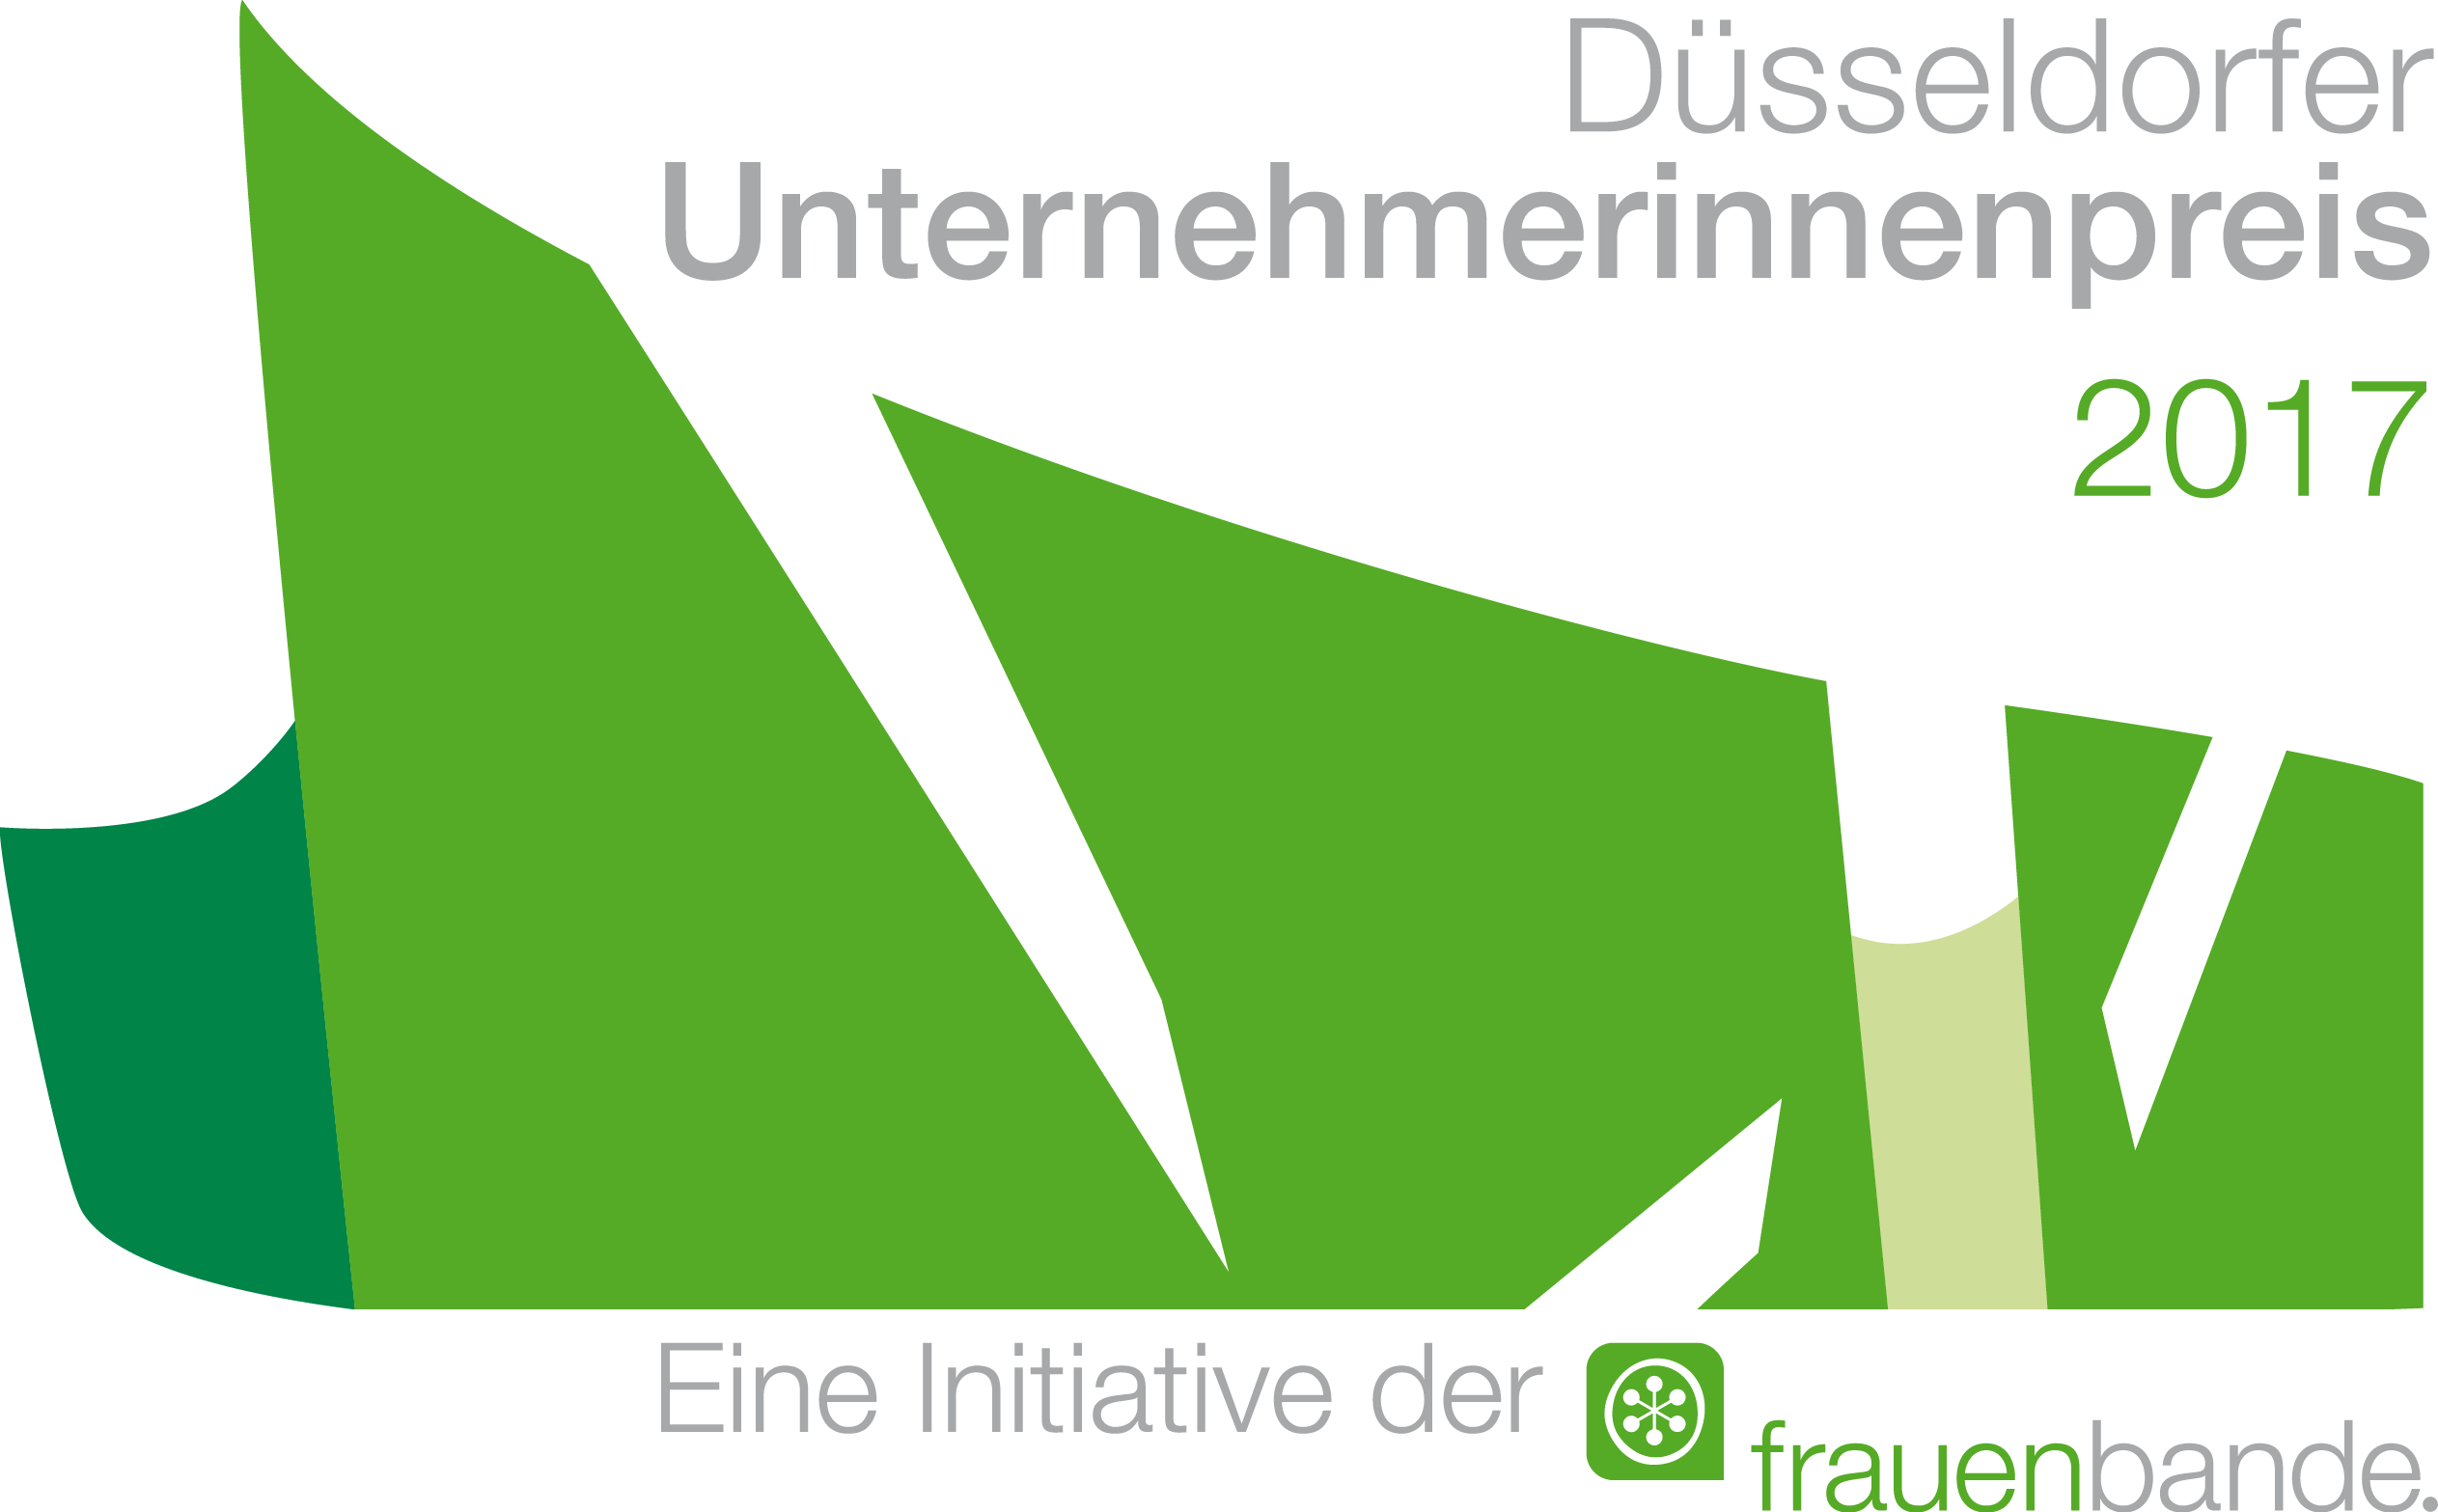 Frauenbande Düsseldorf